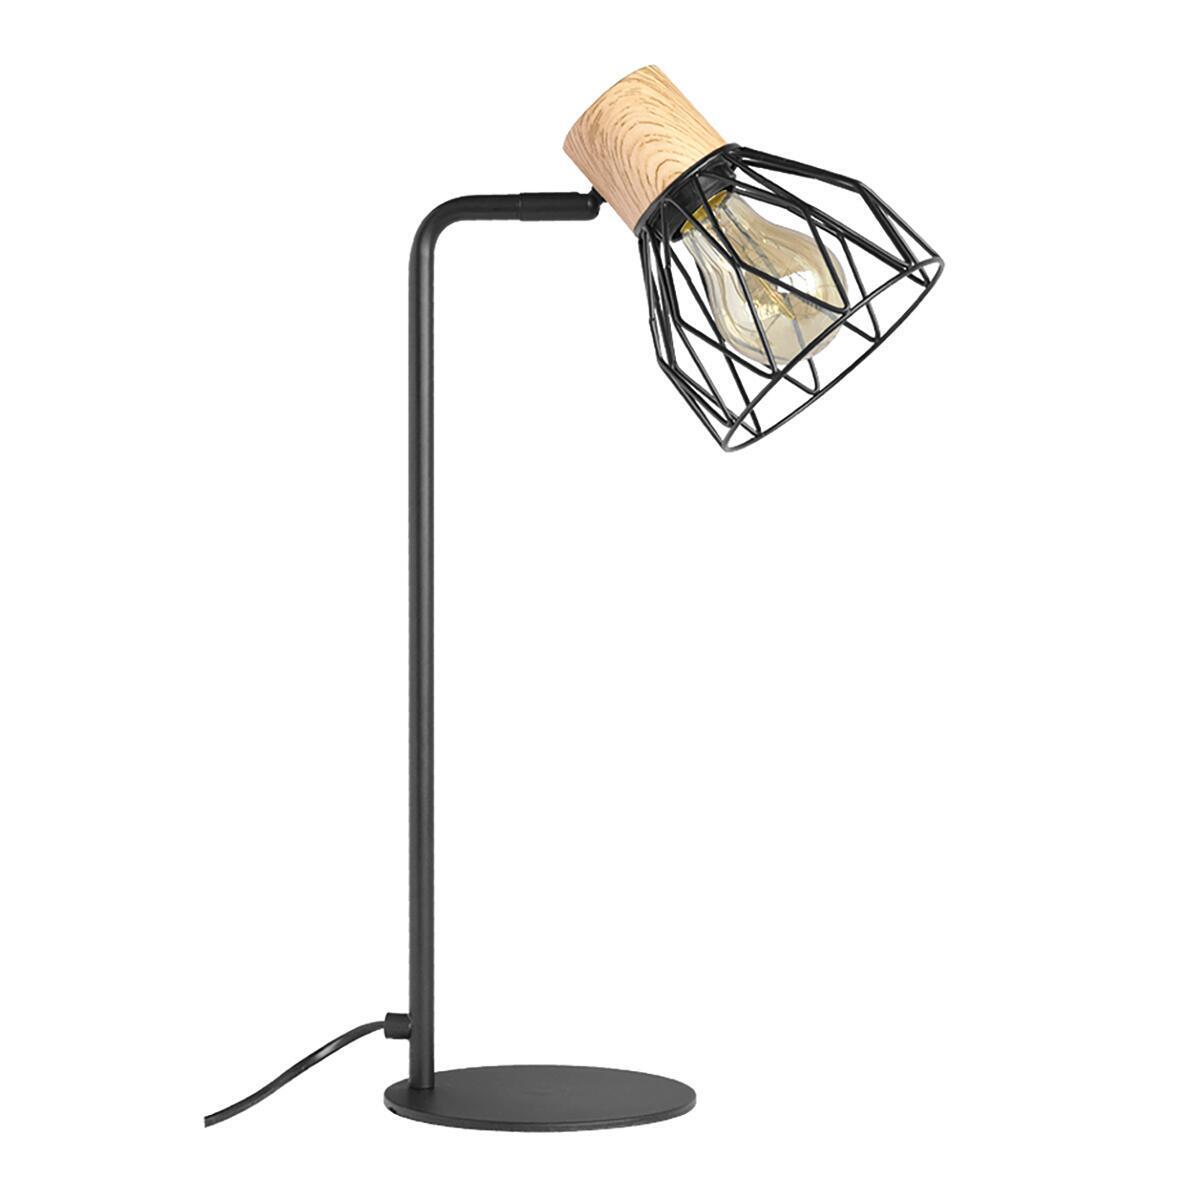 Lampada da tavolo Scandinavo Clayton nero , in legno, SEYNAVE - 2